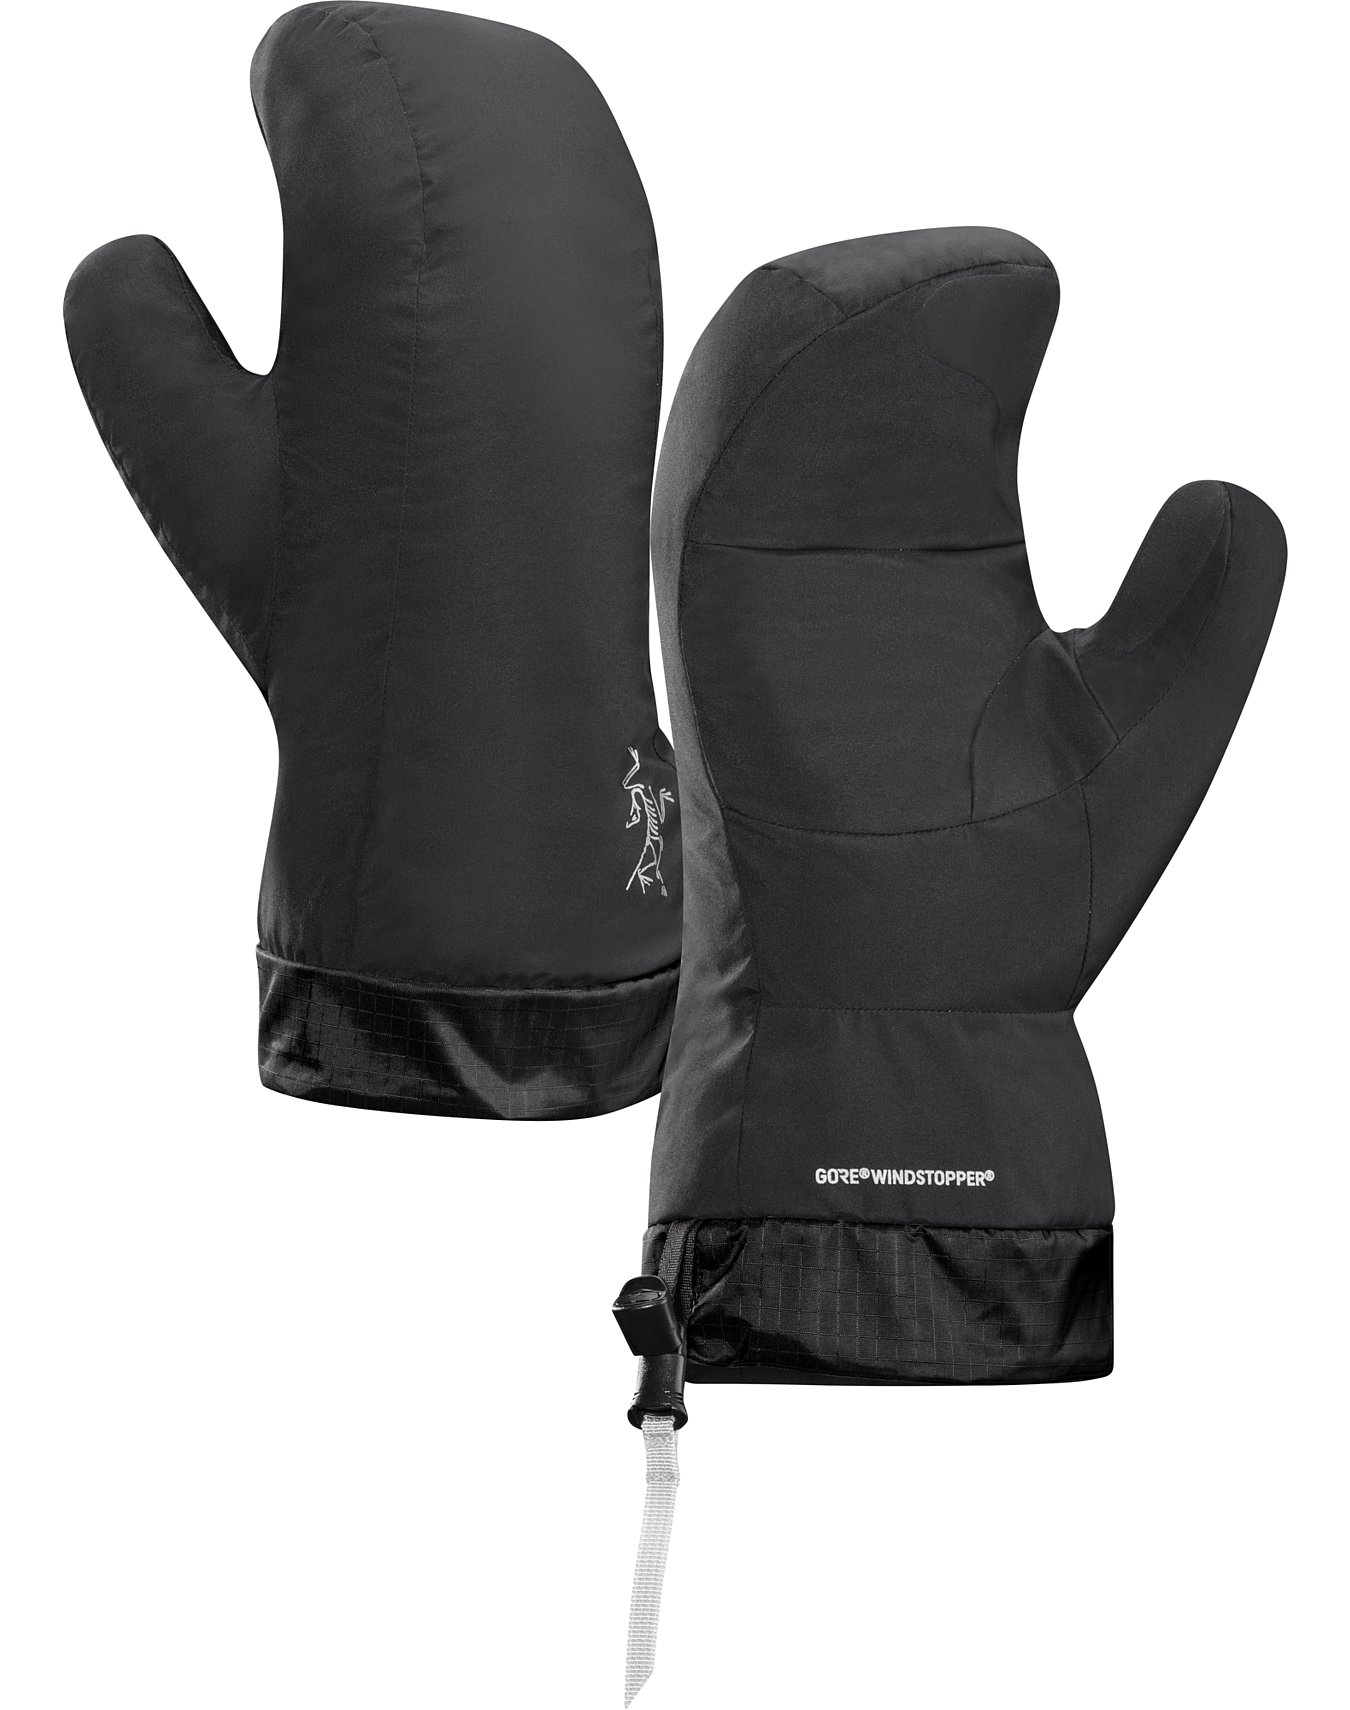 Petit Bateau Girls Glove Liners